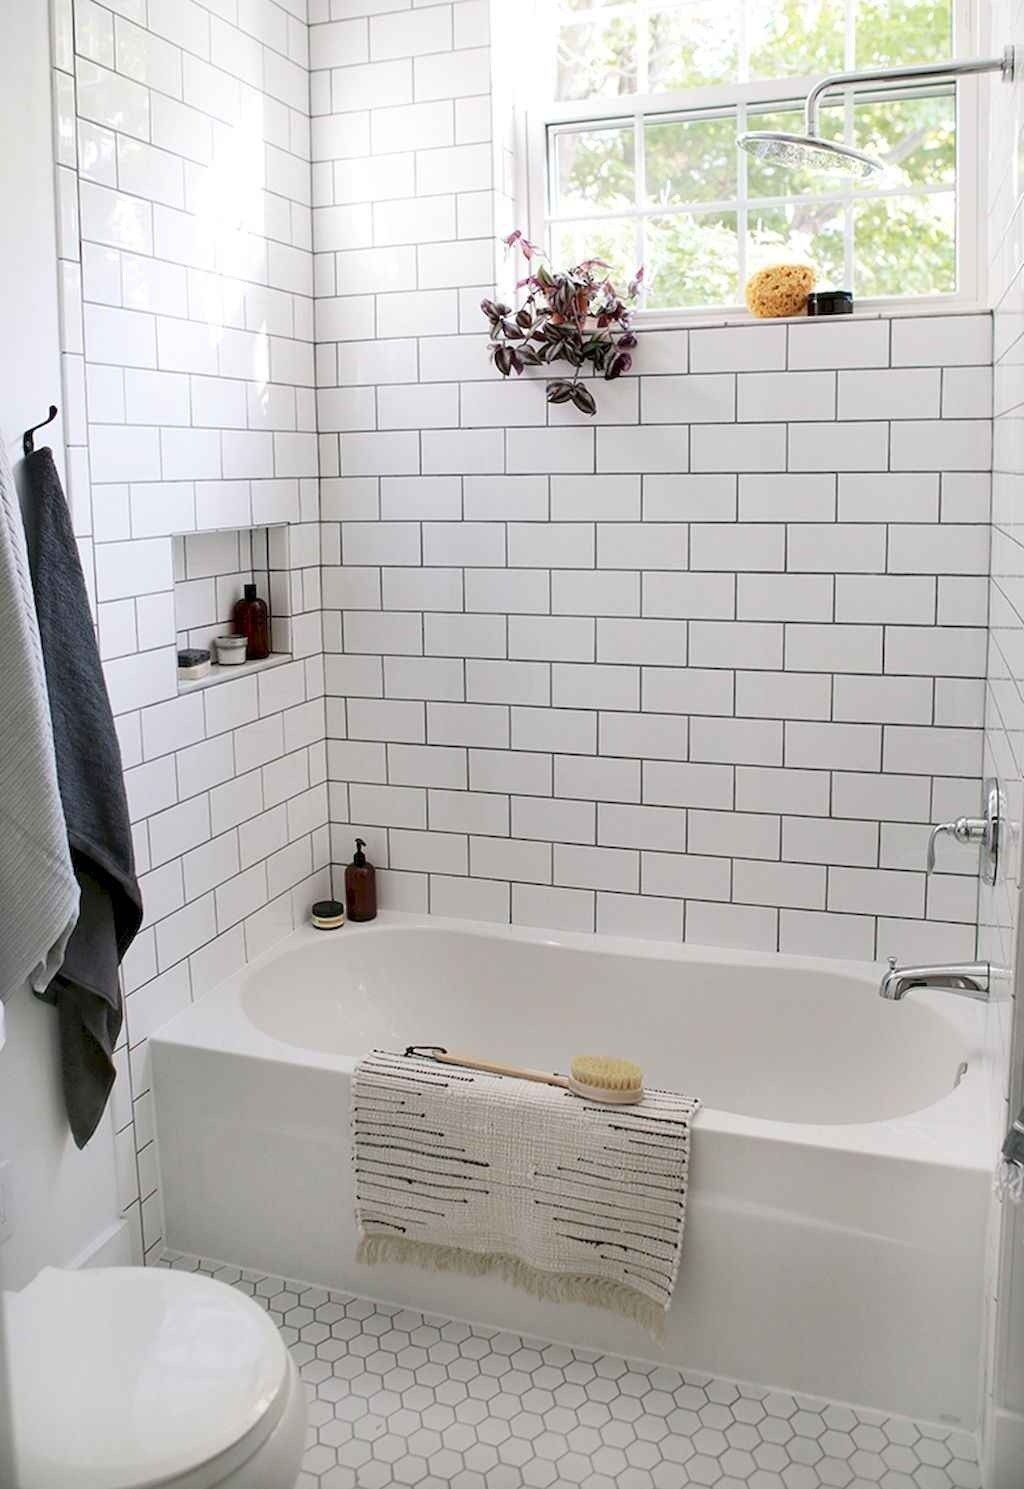 120 Modern Farmhouse Bathroom Design Ideas And Remodel Bathroom Remodel Master Bathroom Remodel Shower Bathrooms Remodel